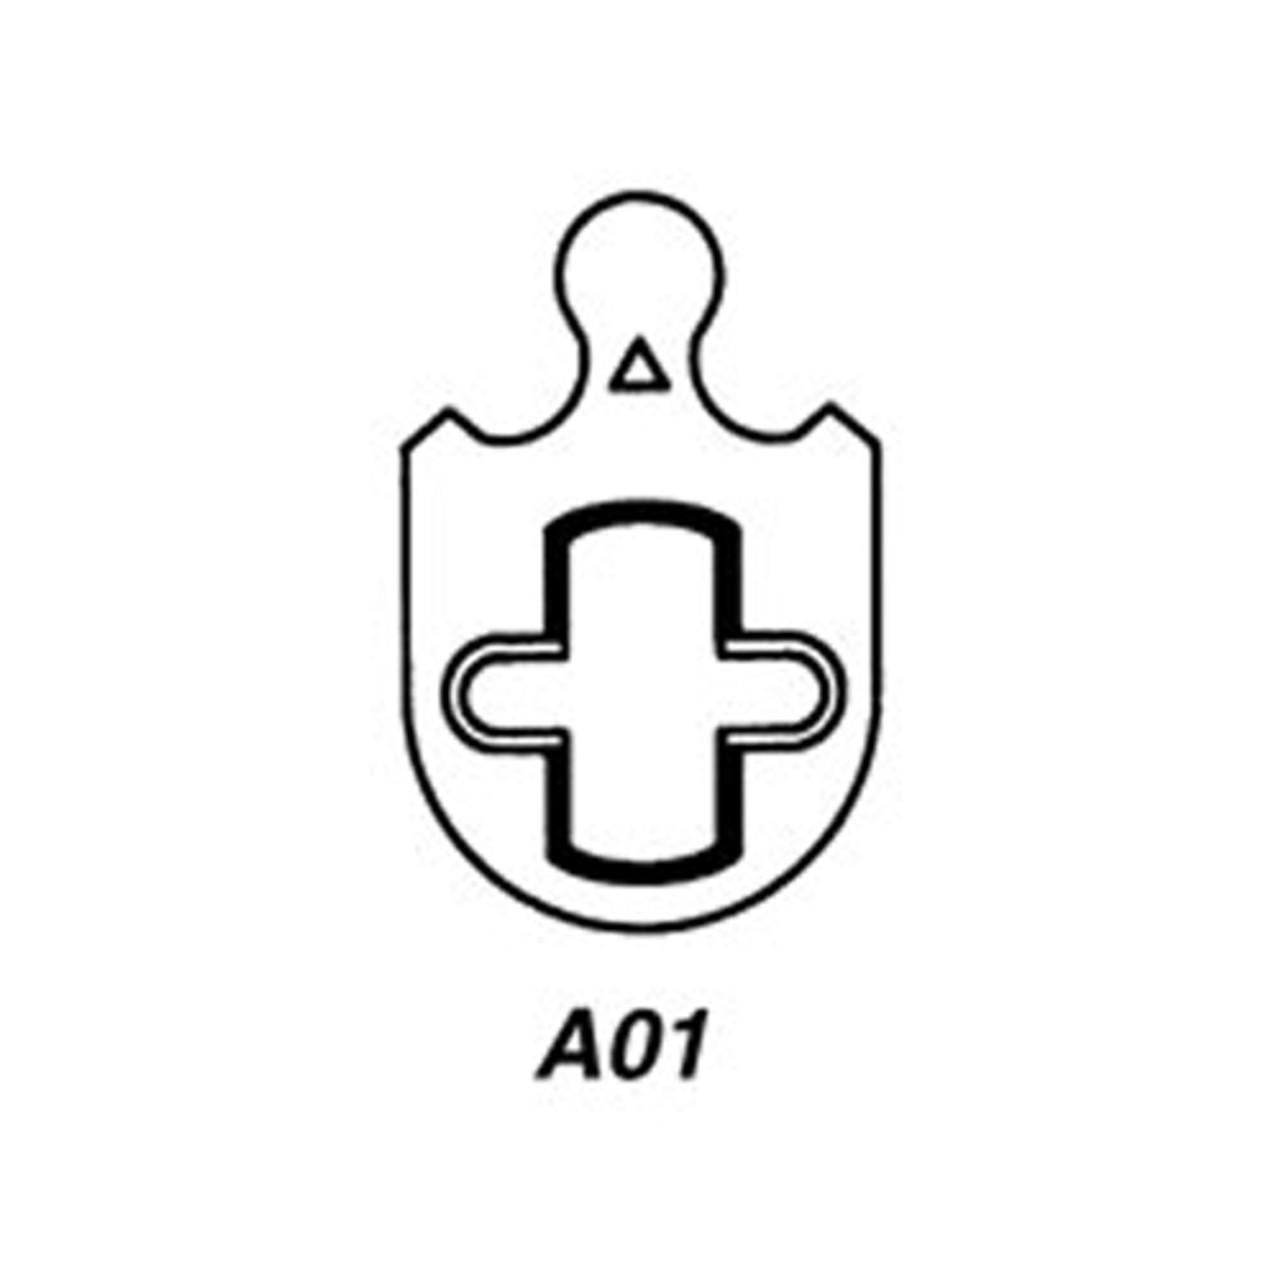 CR1000-114-A01-6-60-605 Corbin Conventional Mortise